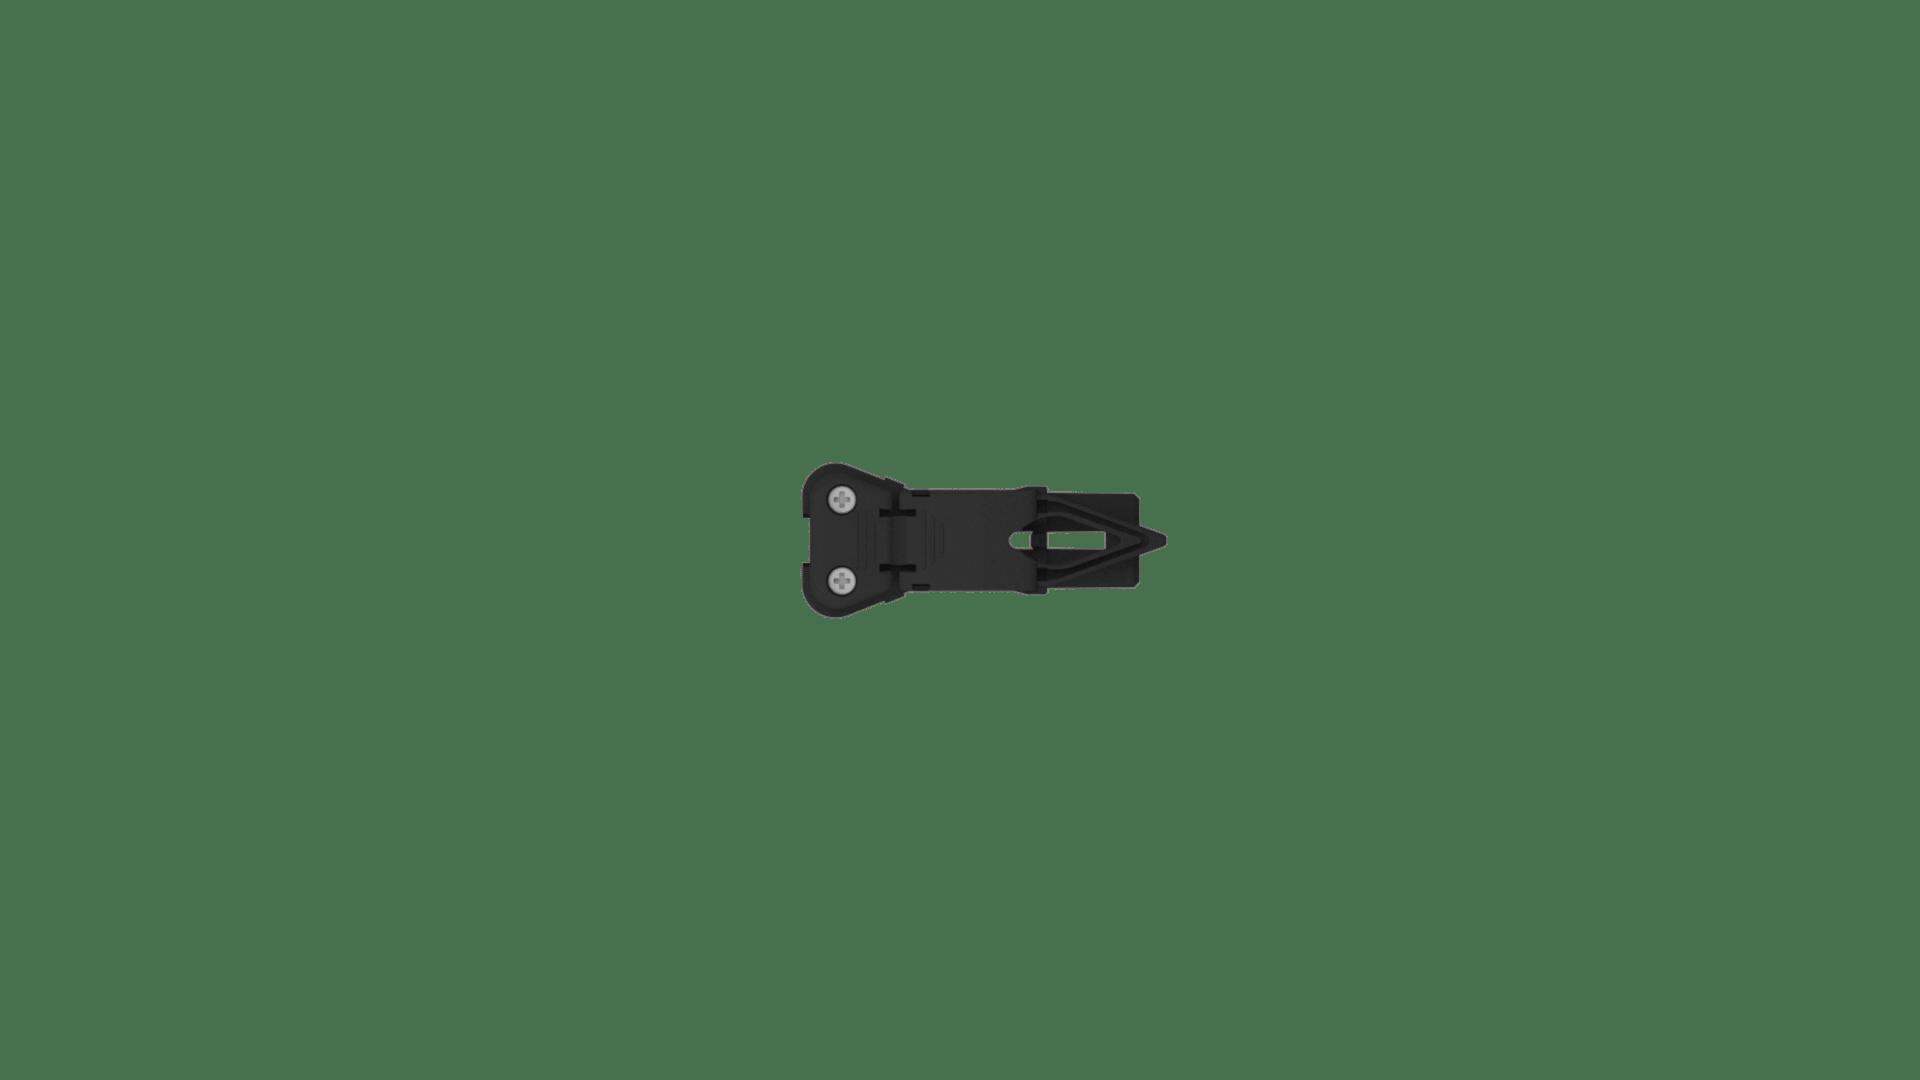 1 conector SA 2P 1H negro_HR_zoom x6